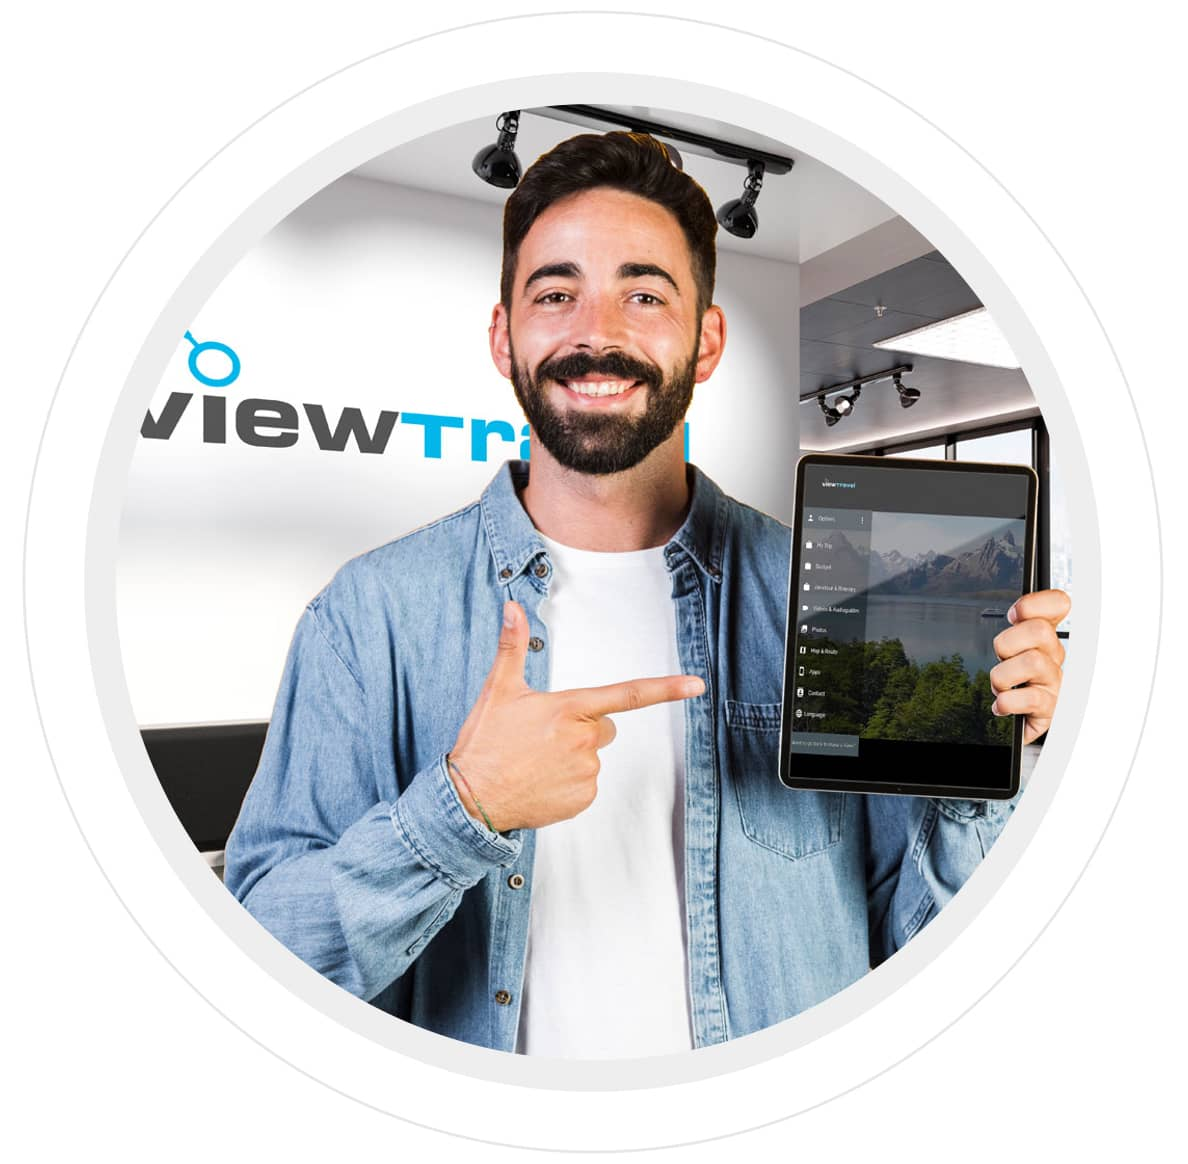 Viewtravel - Impressive Travel Itinerary Presentations